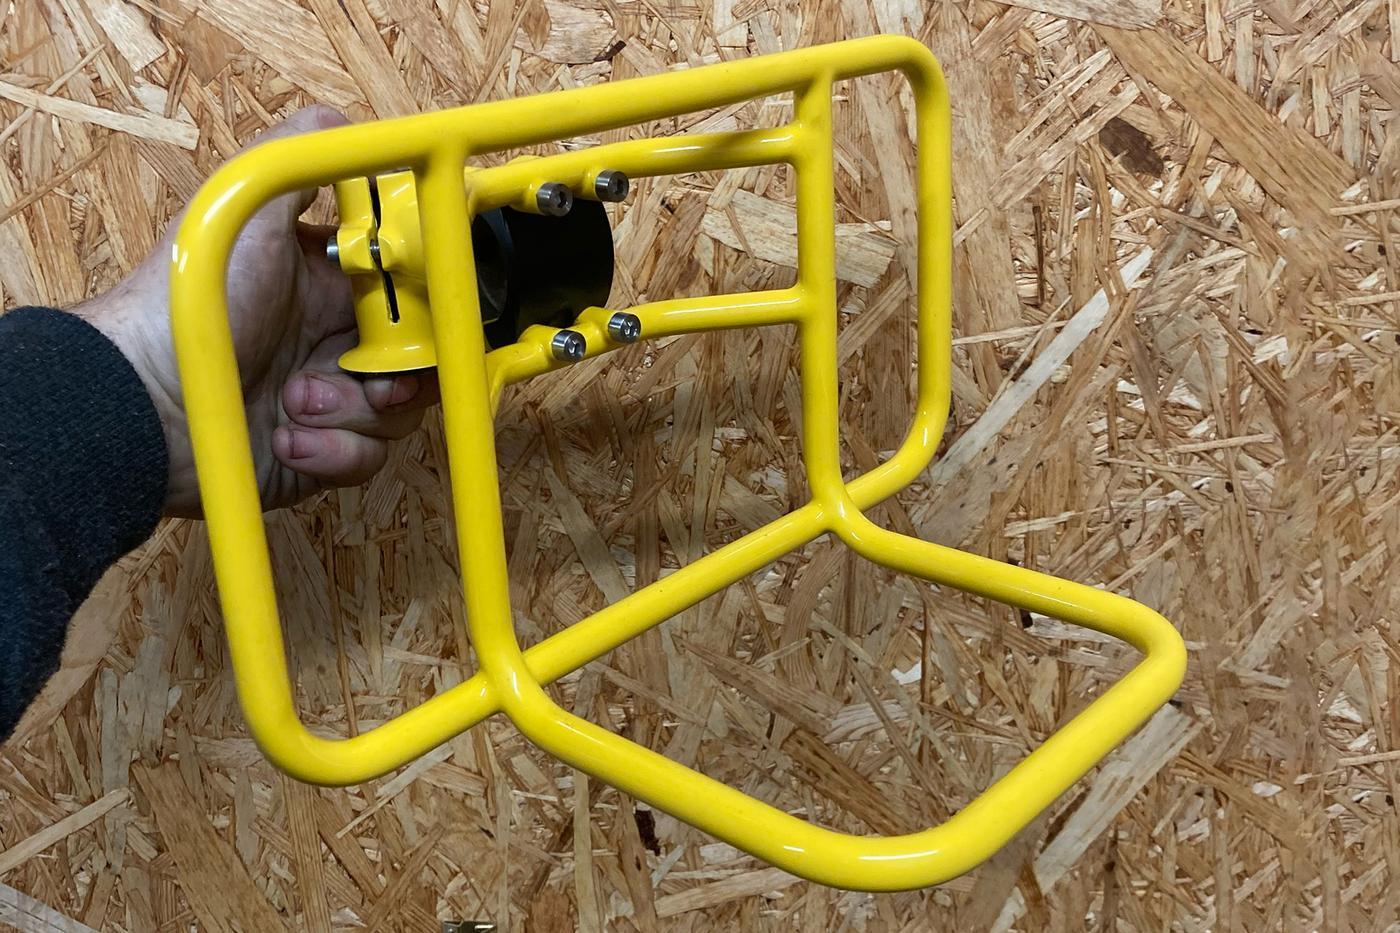 August Bicycles: Stem Rack Prototype